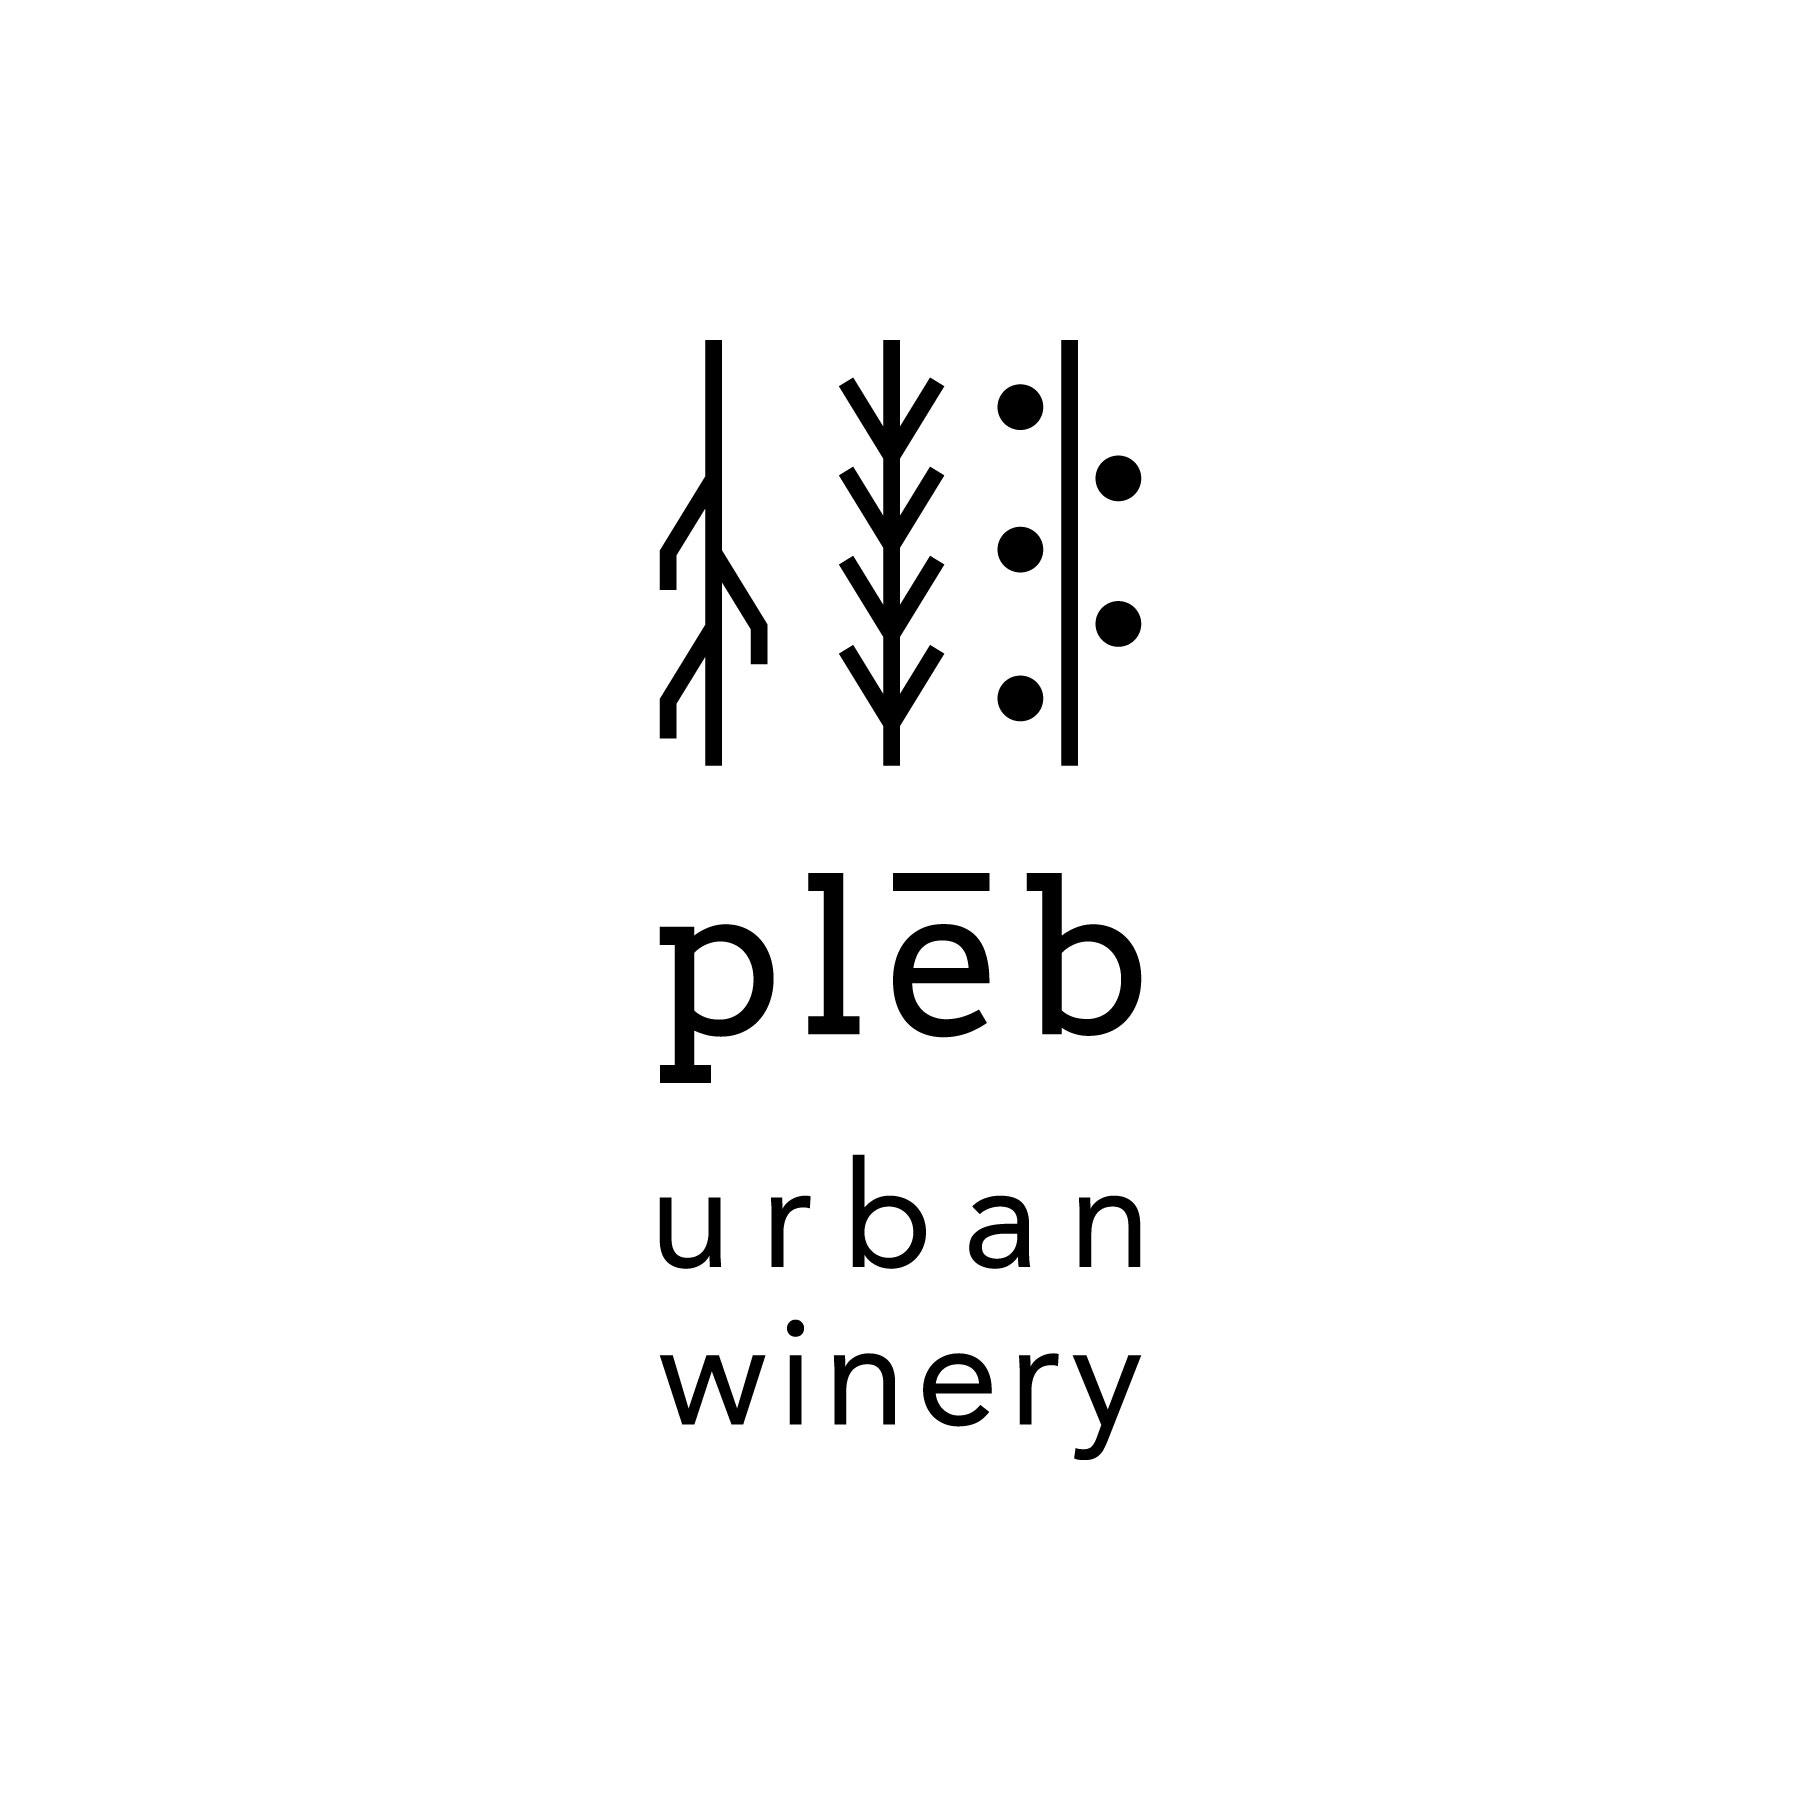 pleb-logo-1.jpg